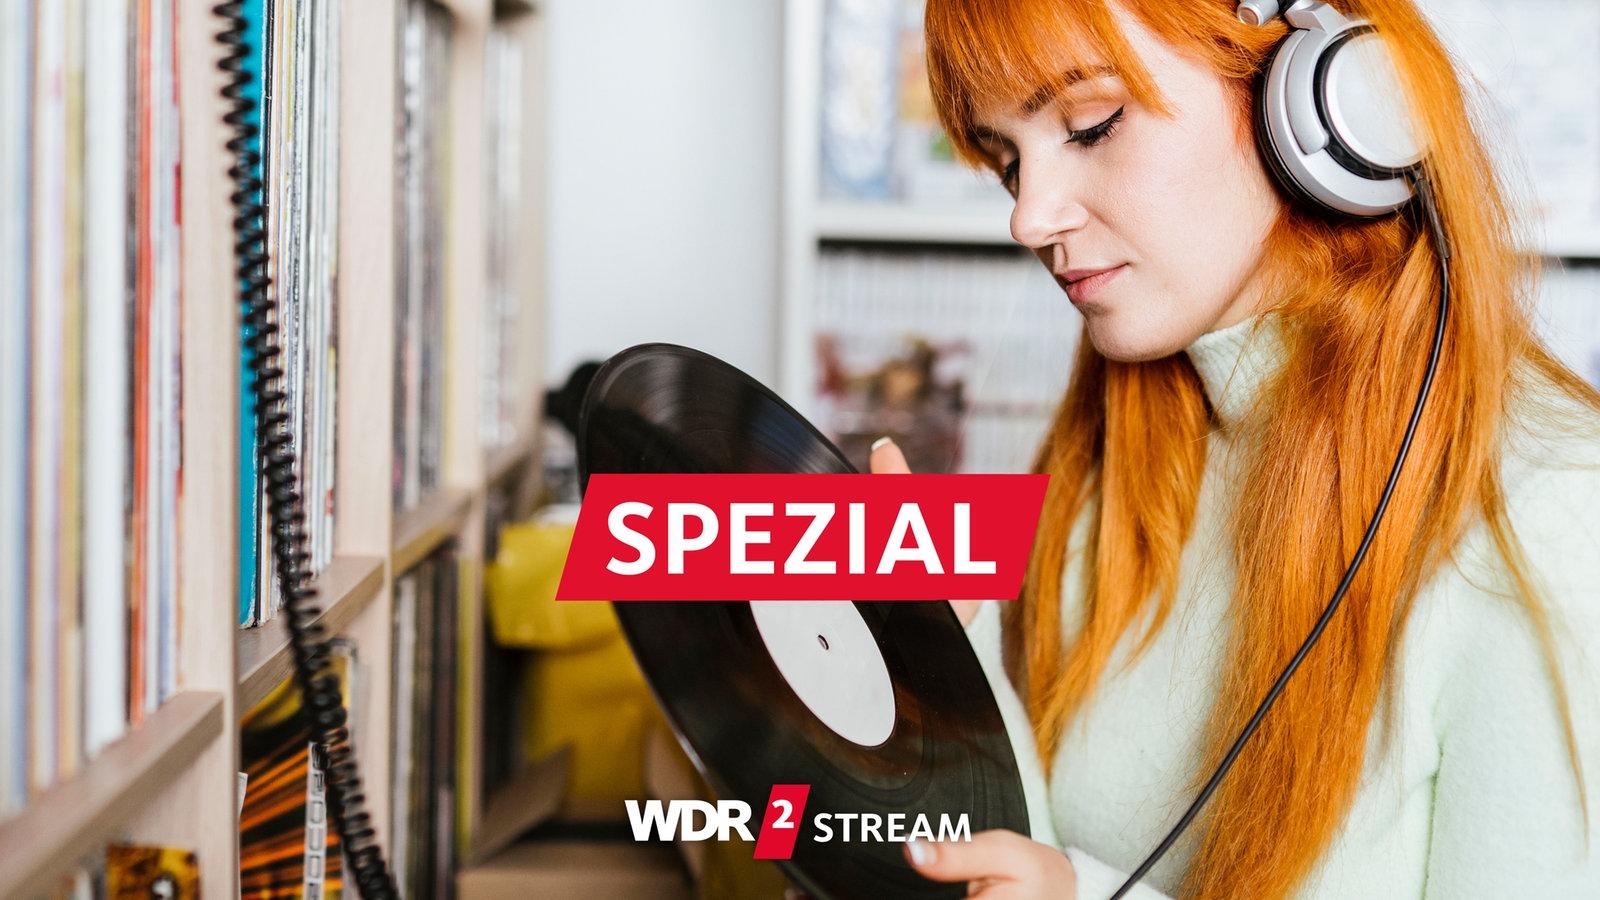 Wdr 2 Stream